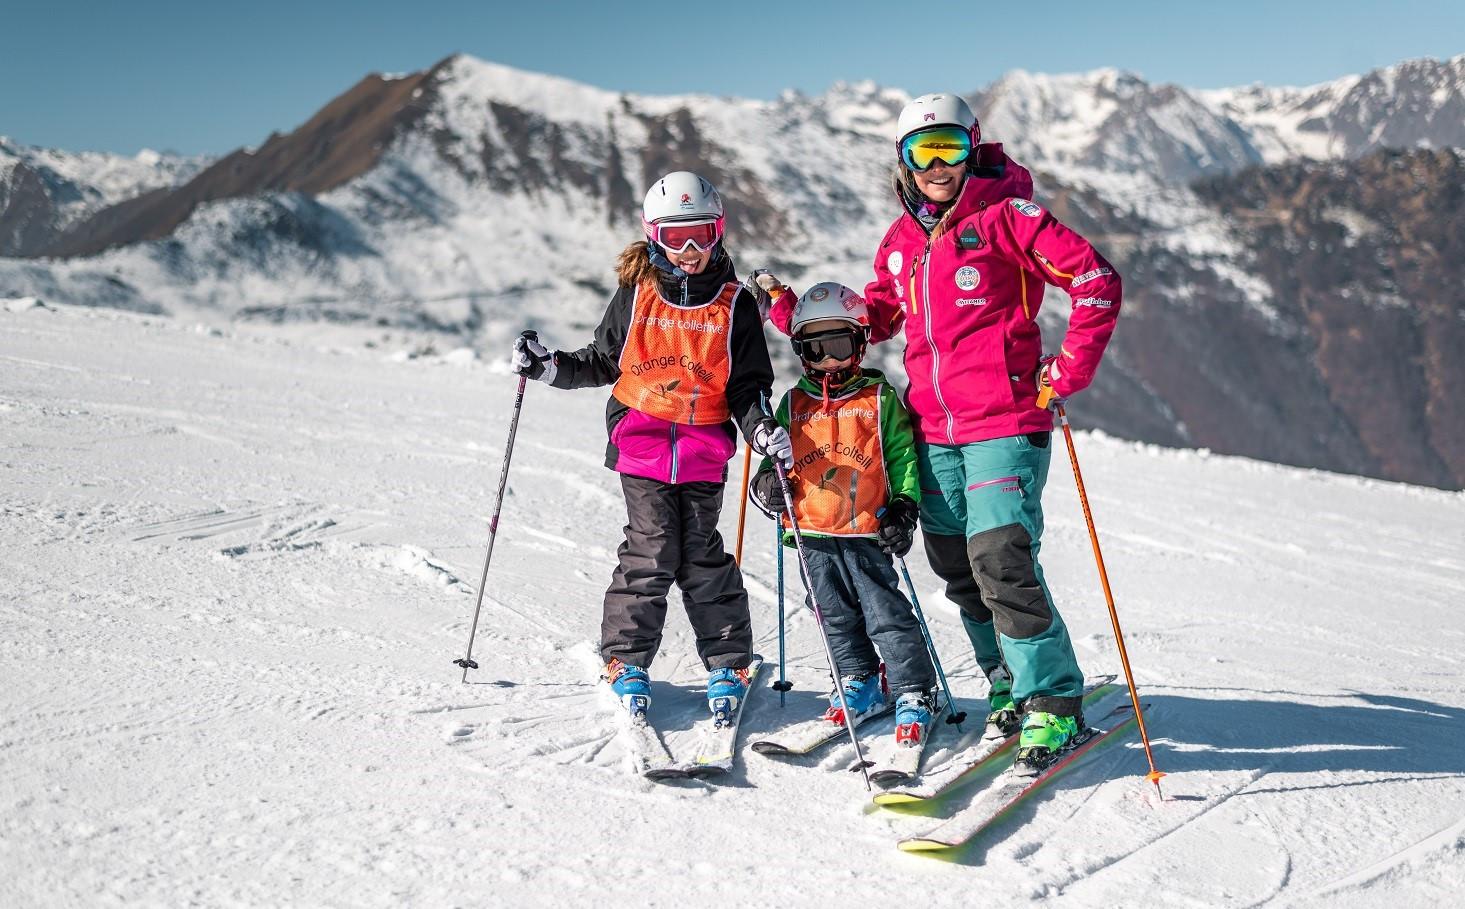 Lezione privata di sci all'Alpe di Mera in Valsesia per tutti i livelli